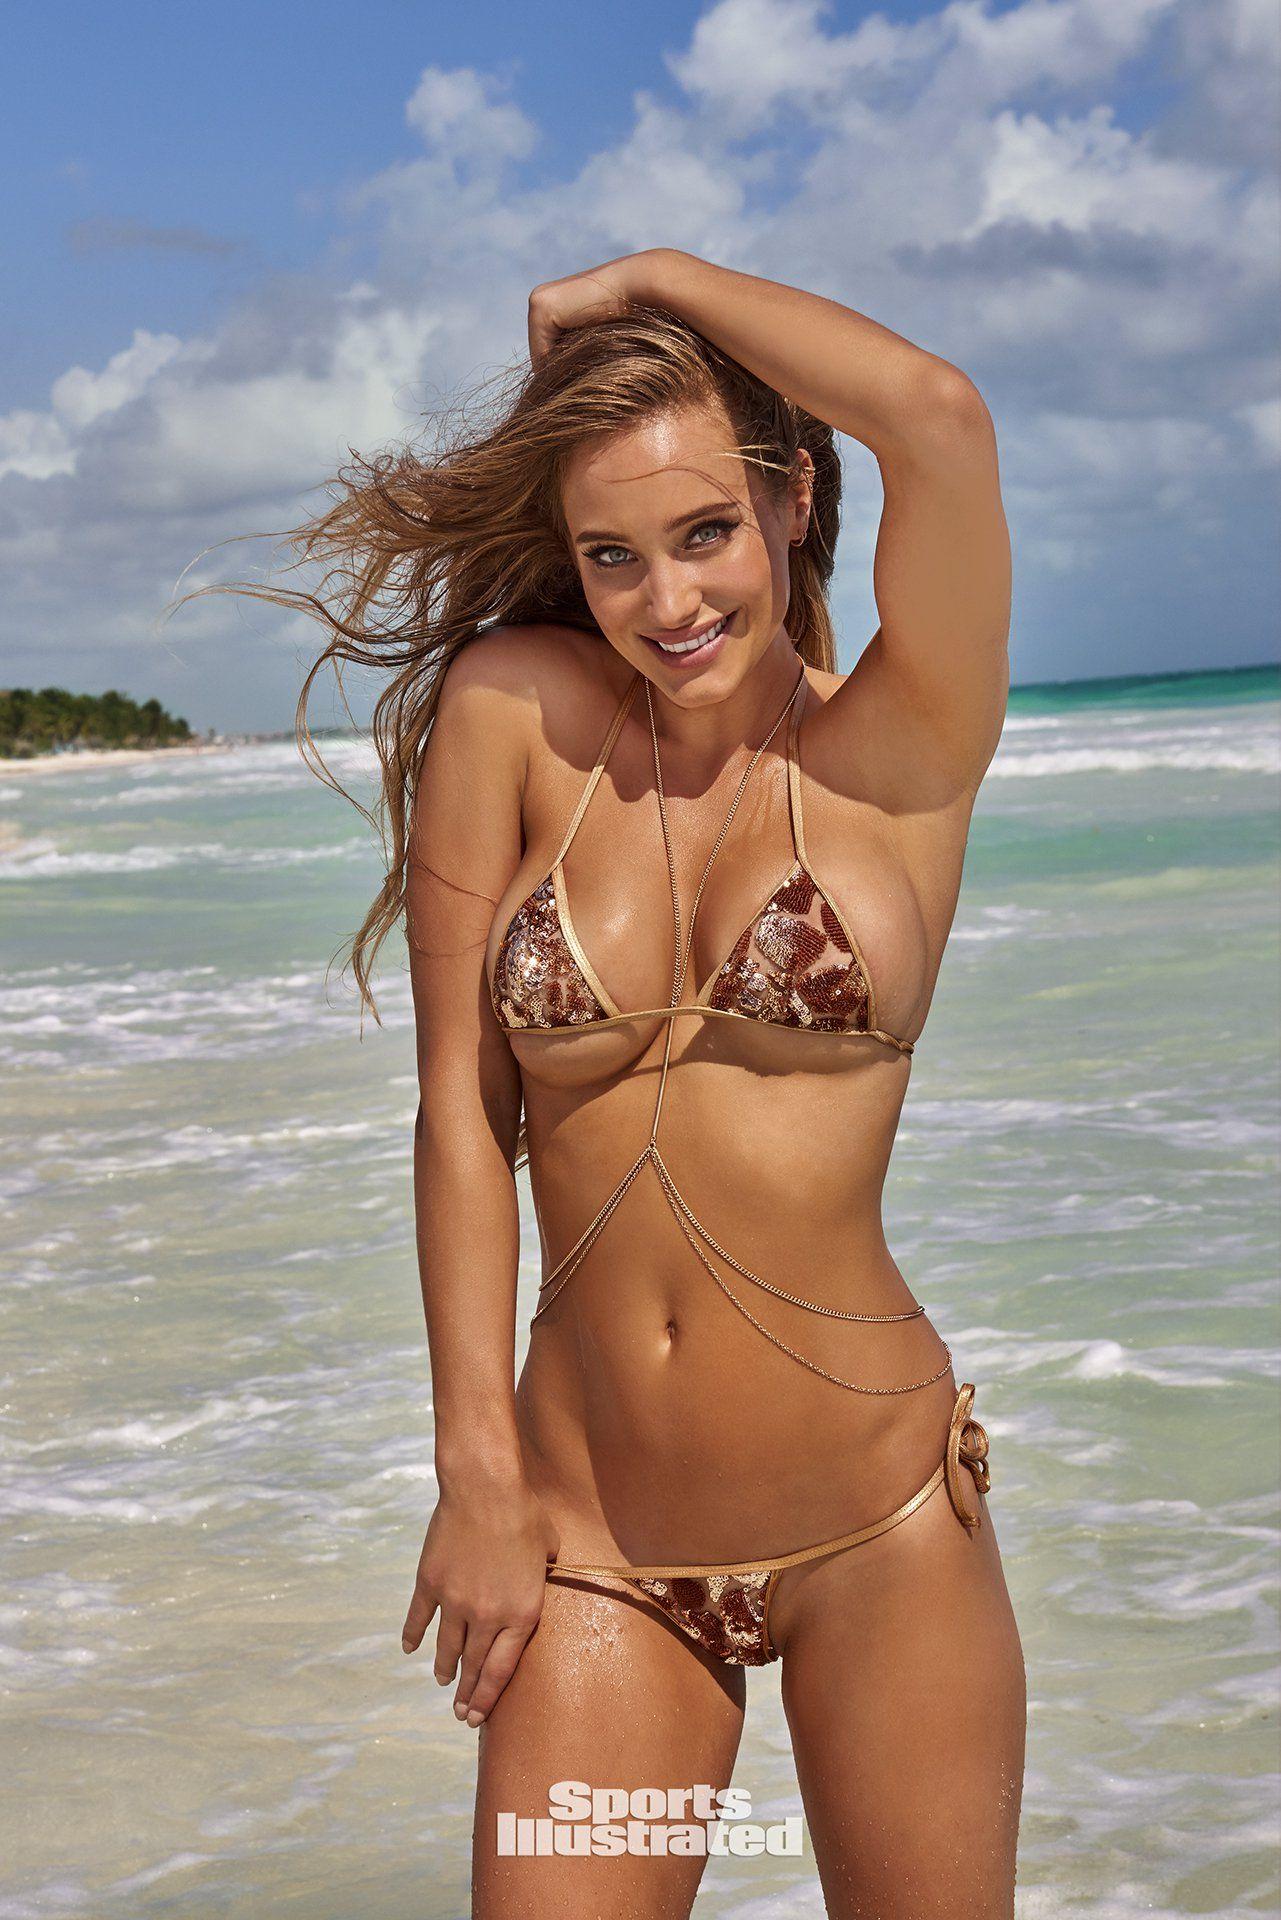 Sexy Hannah Jeter nude photos 2019